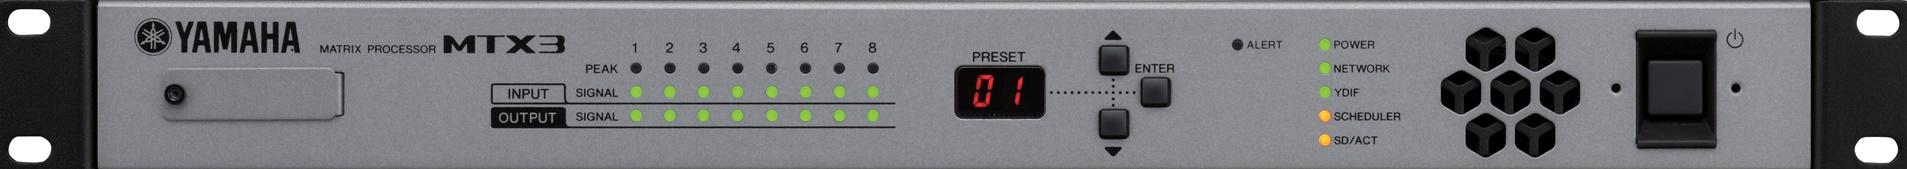 yamaha processor mtx3 front